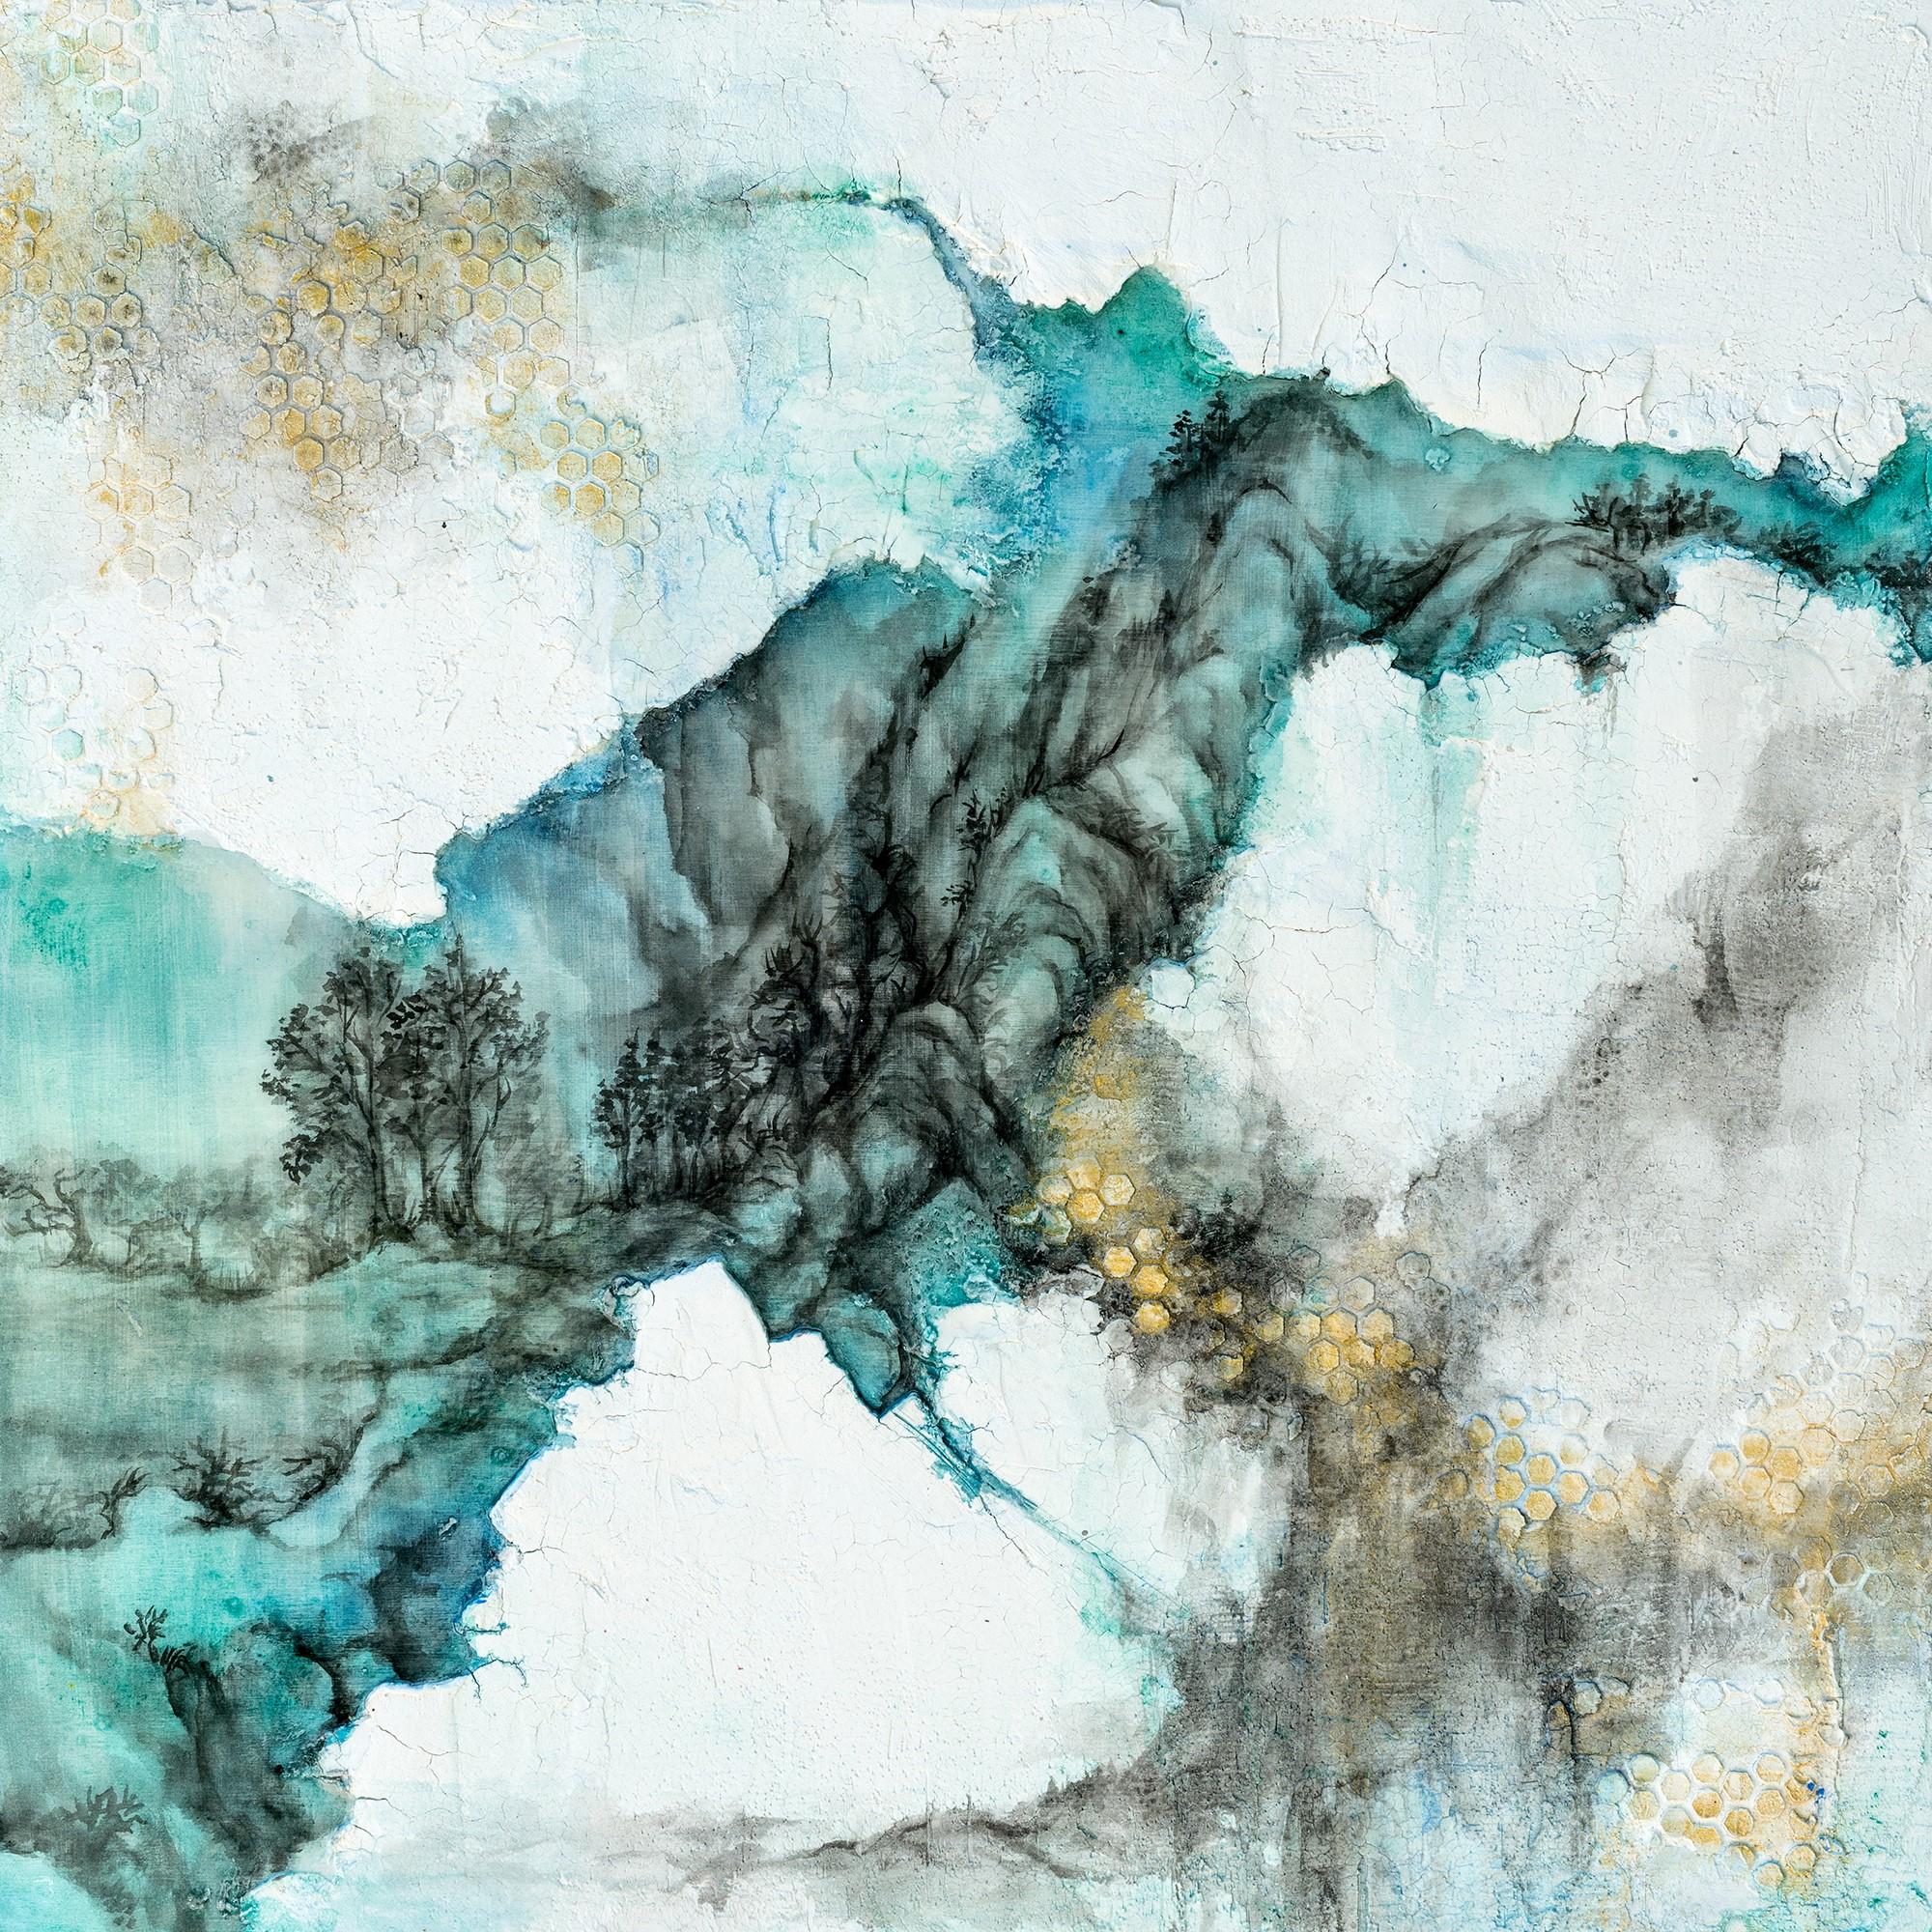 Chasm I by Cindy Shih